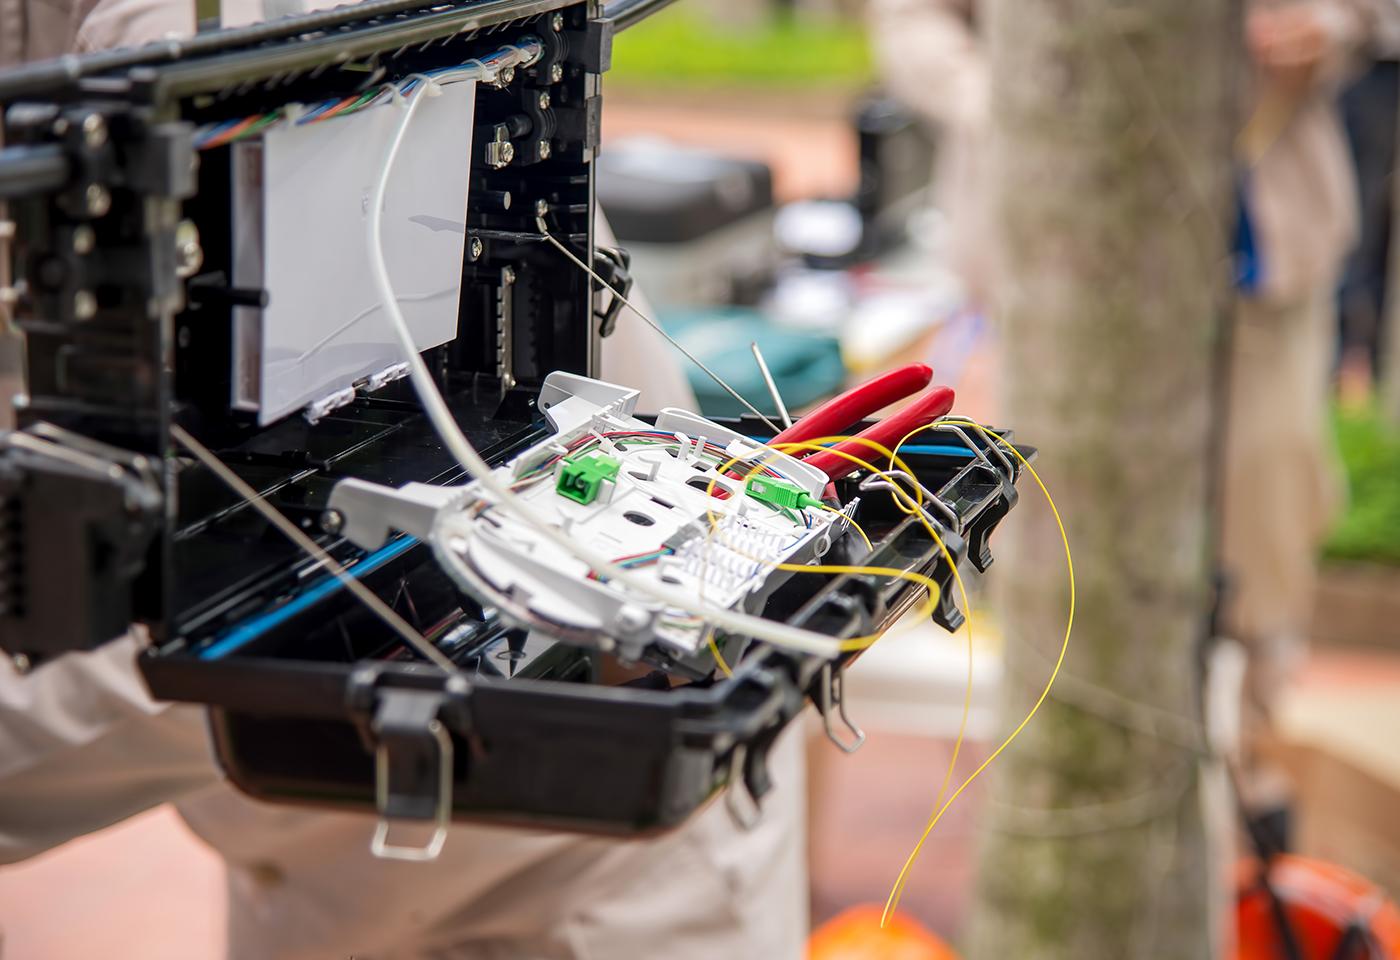 Fibre_0002_technicians-are-install-cabinet-on-fiber-optic-cab-P5C9WEP